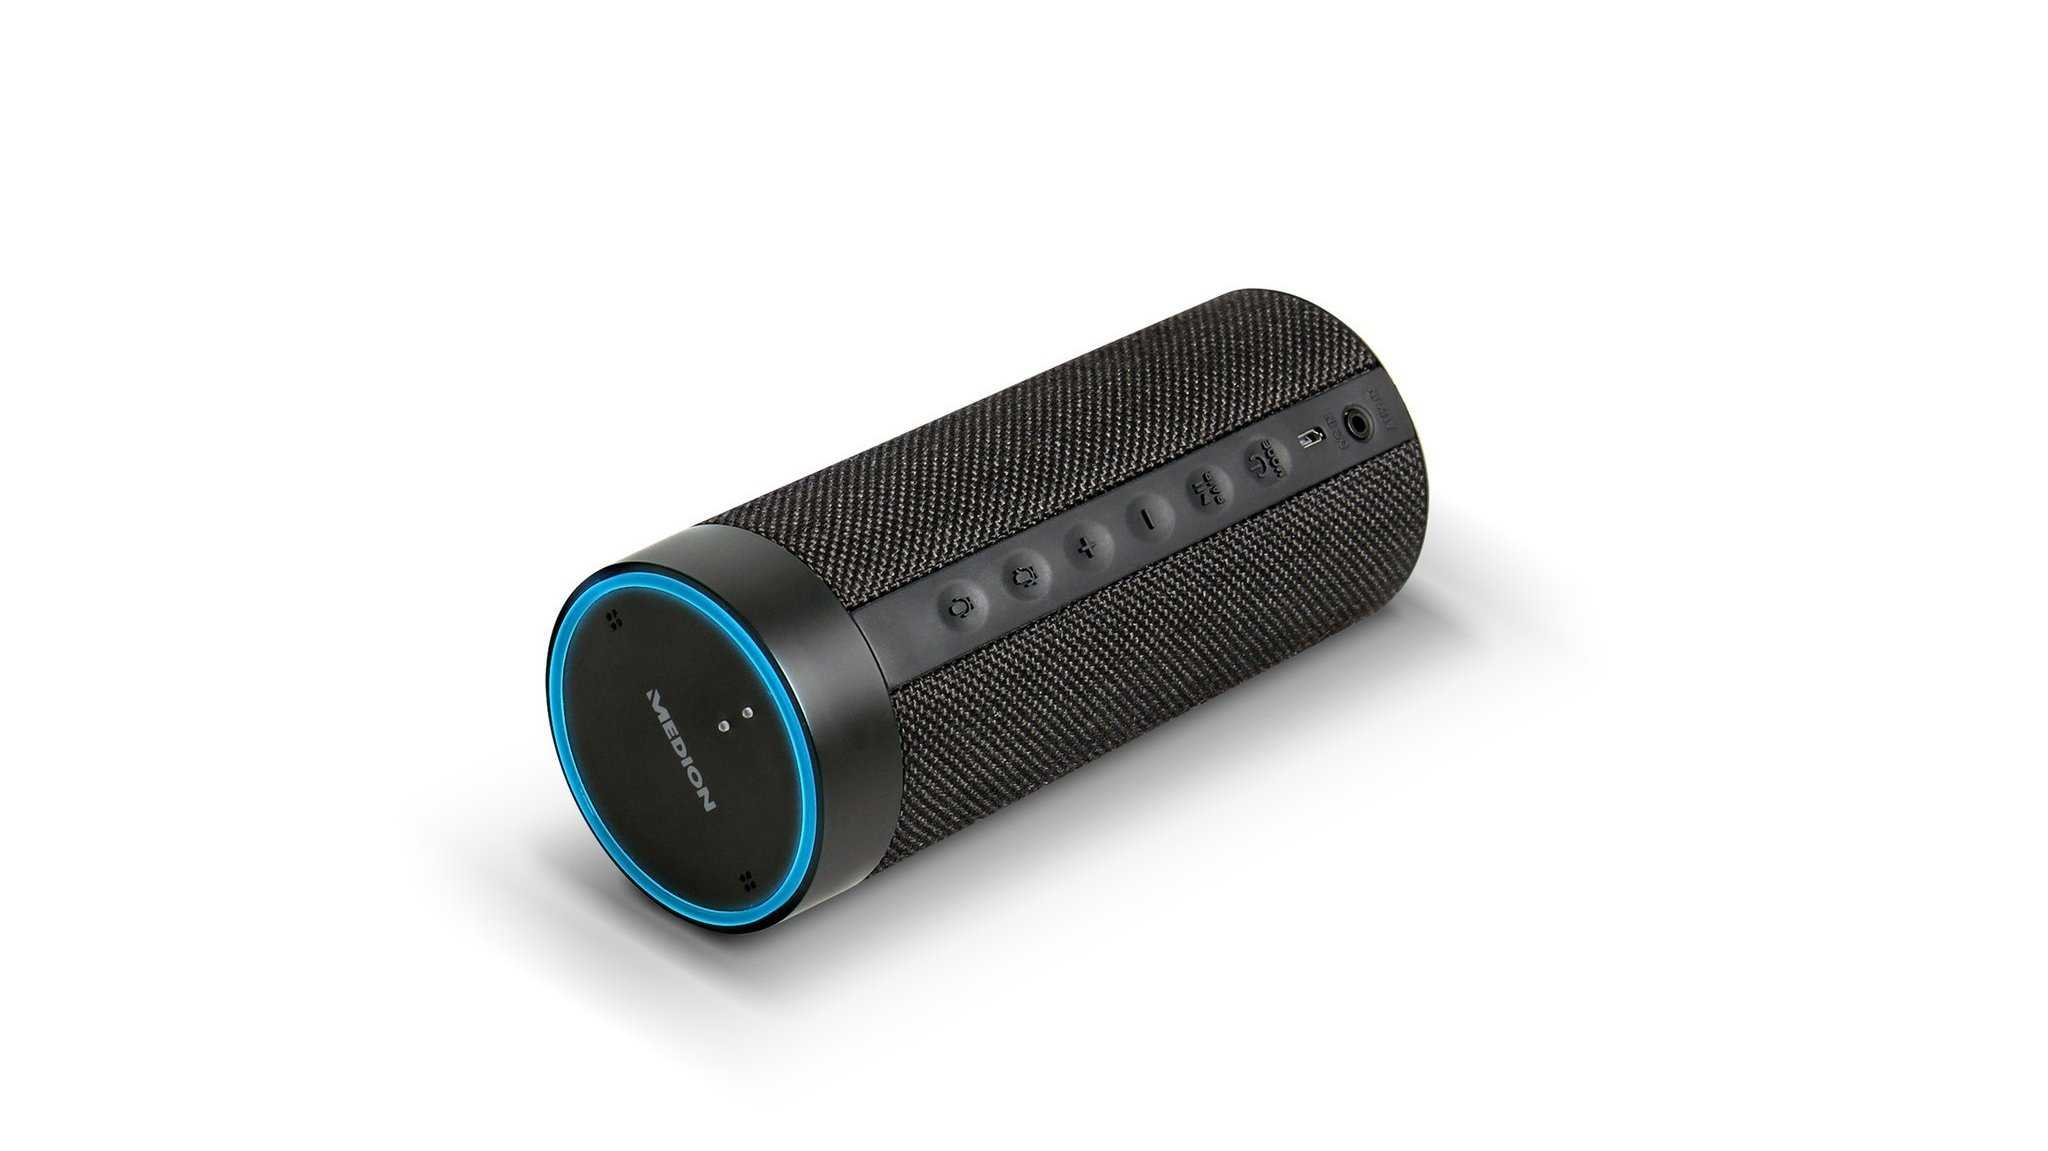 Medion: Neuer Alexa-Lautsprecher funktioniert auch kabellos